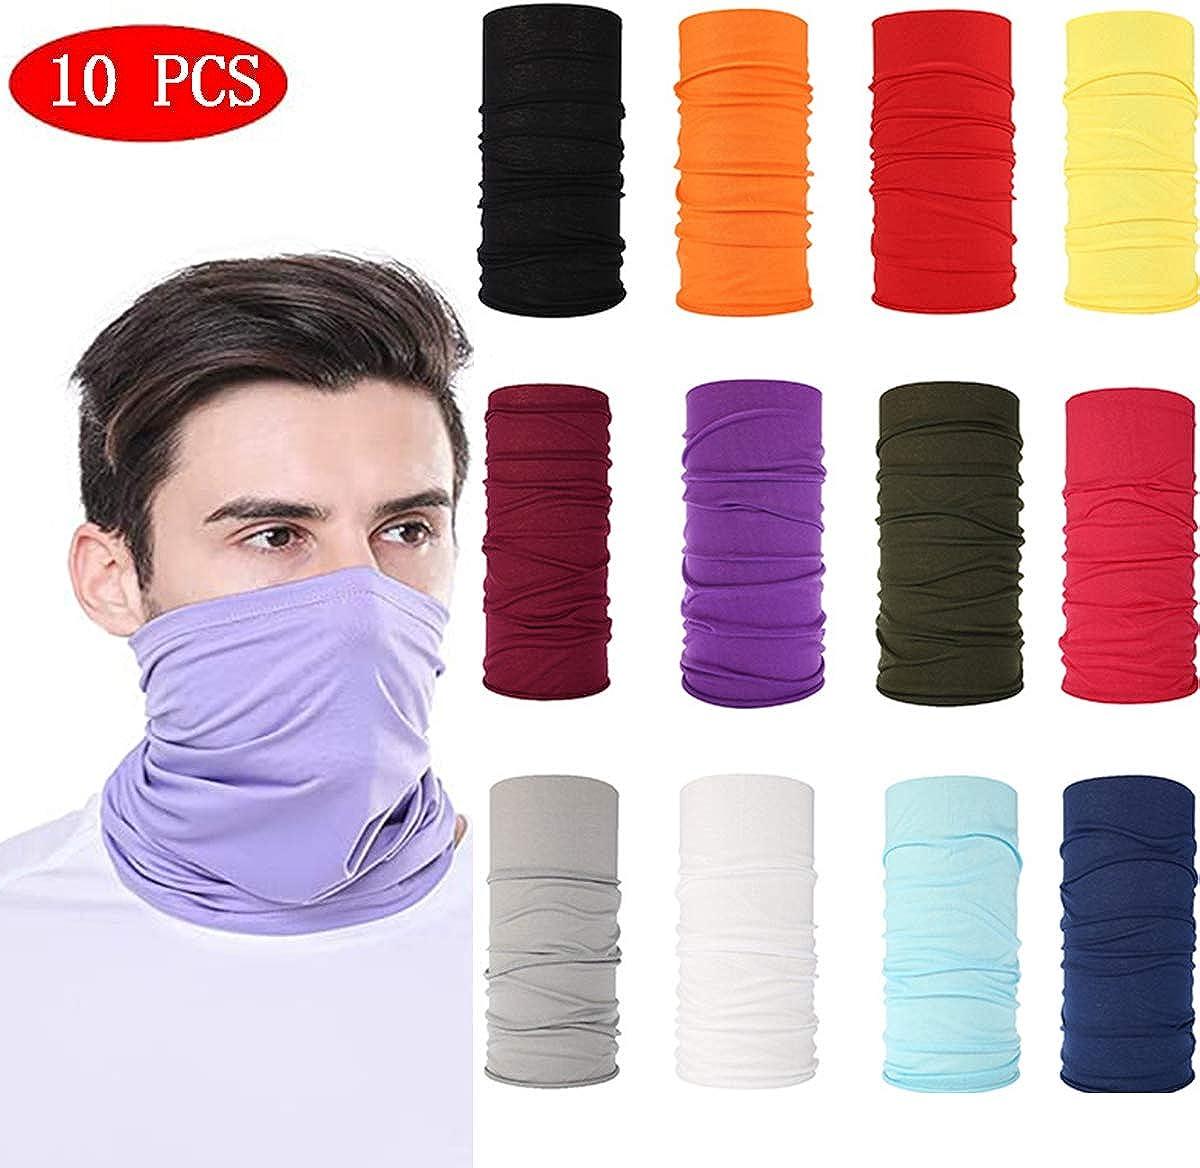 Multi-purpose Face Cover for Men Women 10pcs Scarf Bandanas Neck Gaiter